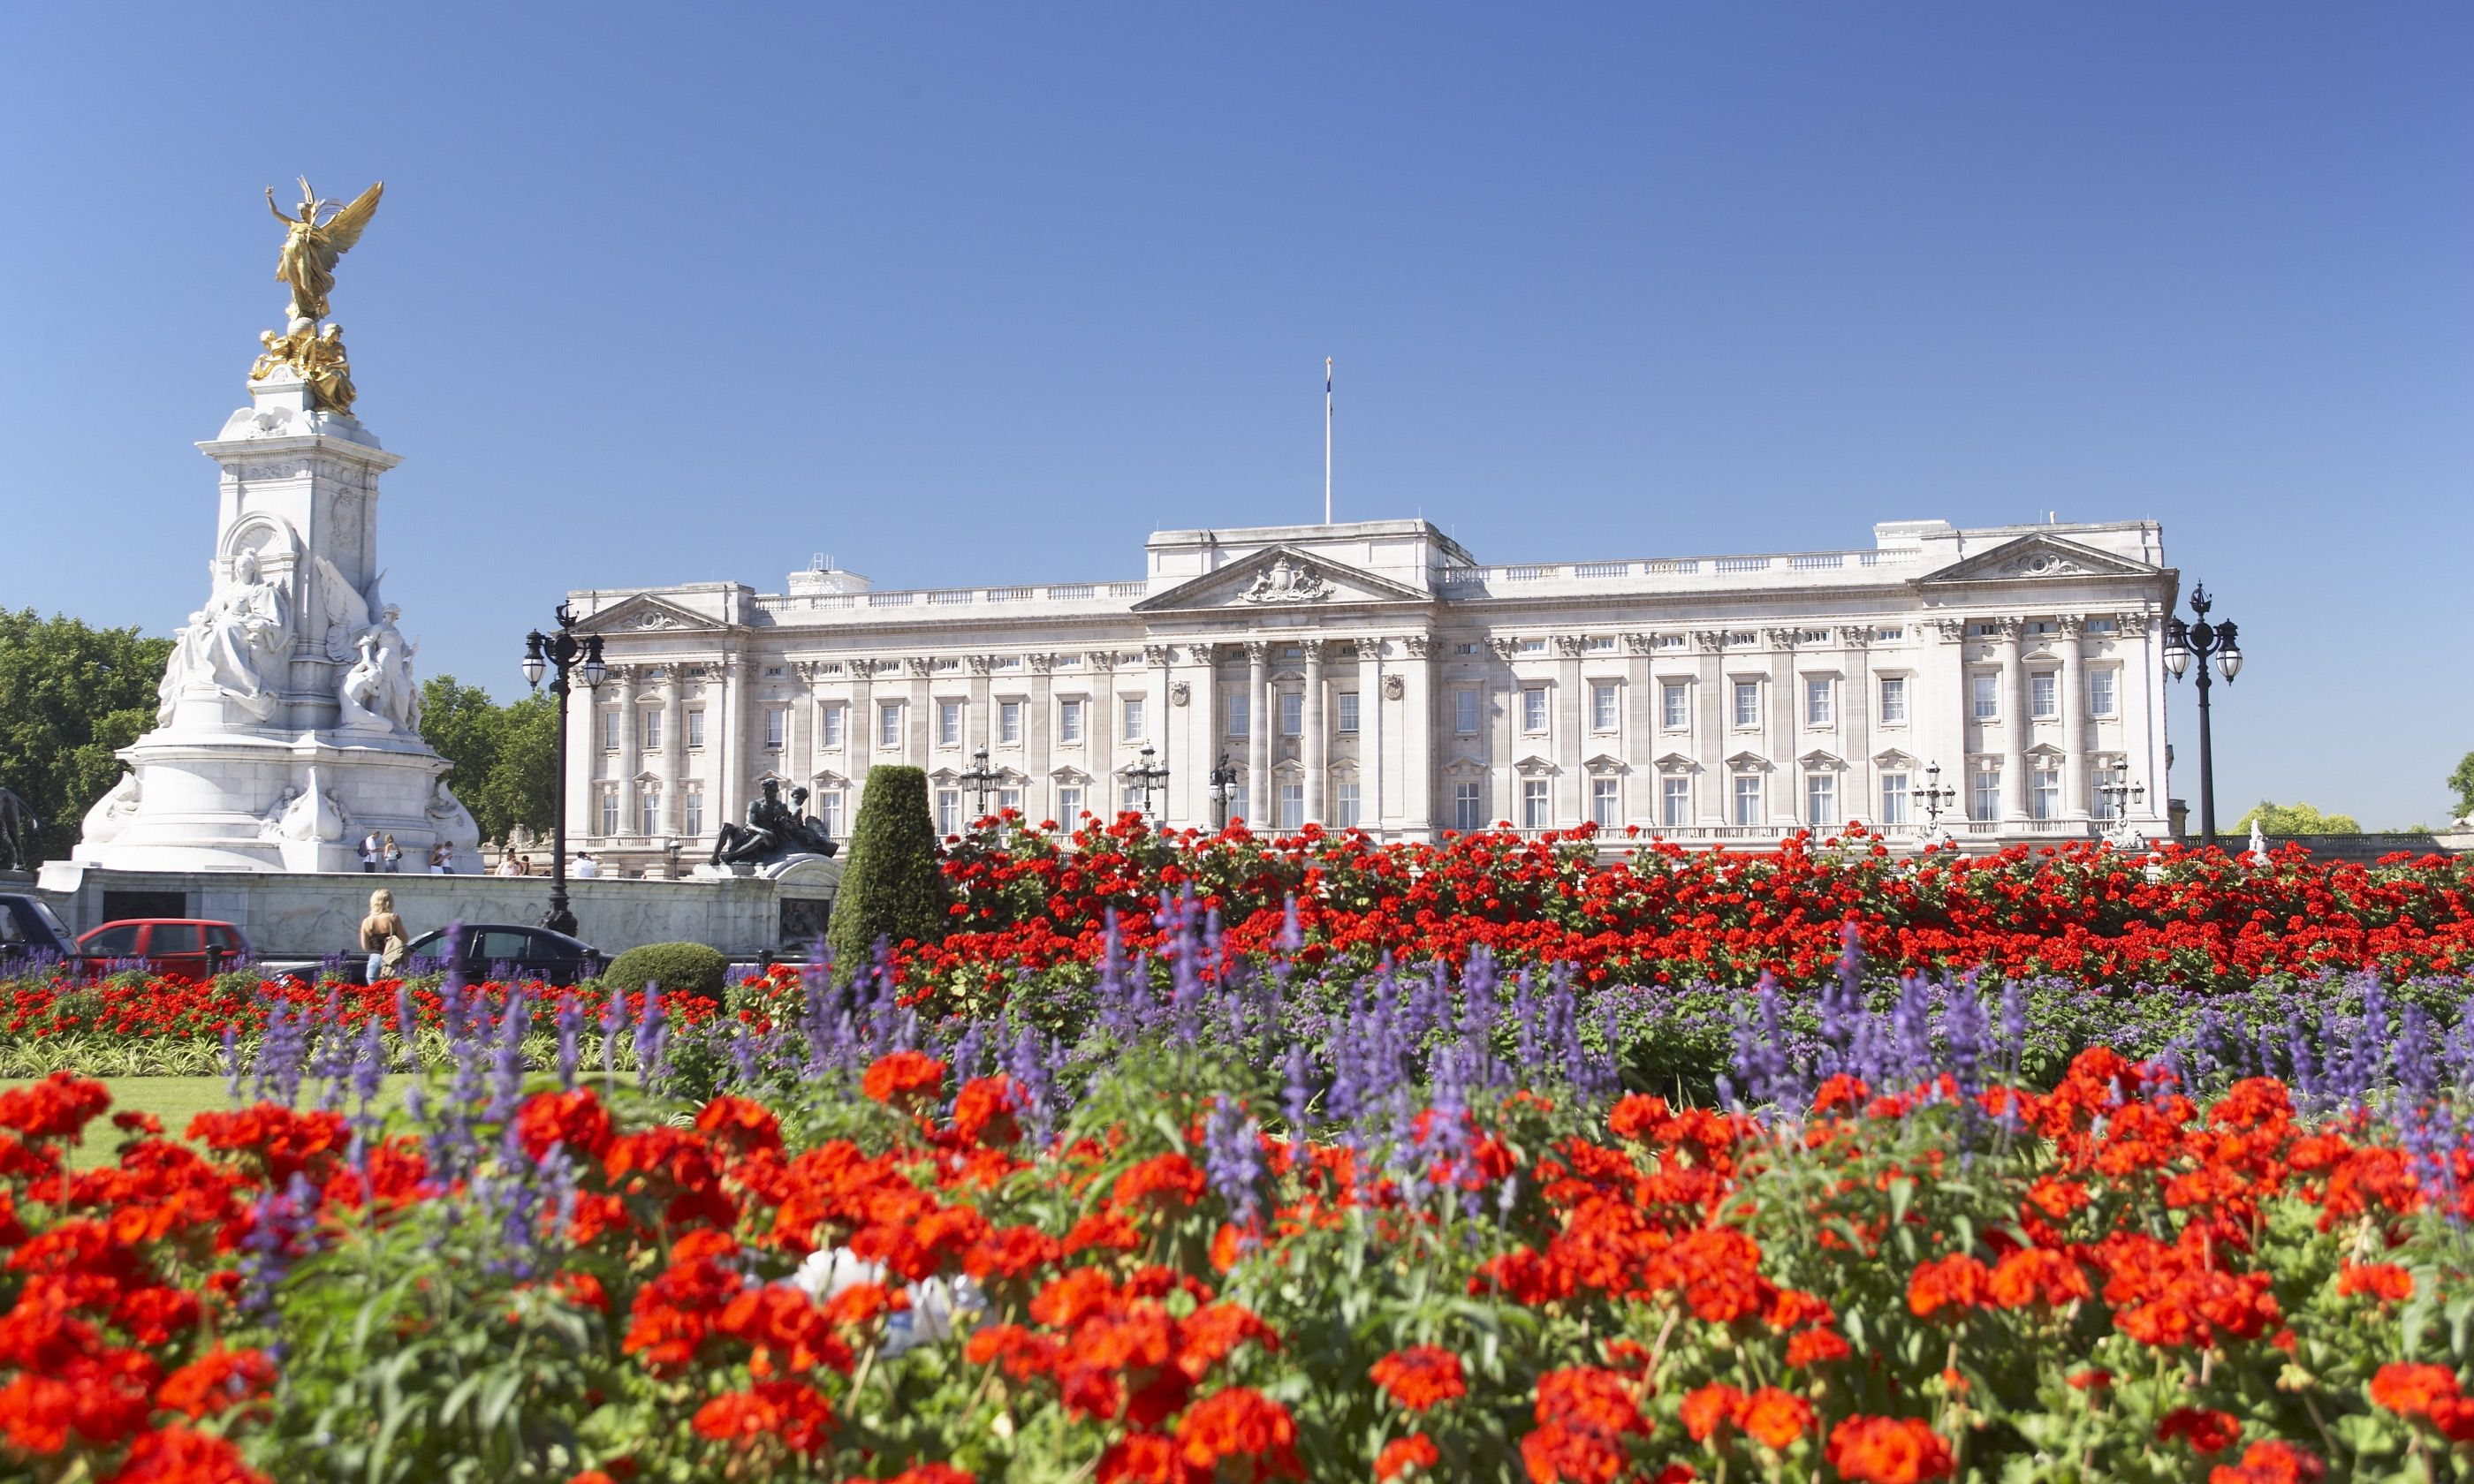 Buckingham Palace in spring (Shutterstock.com)